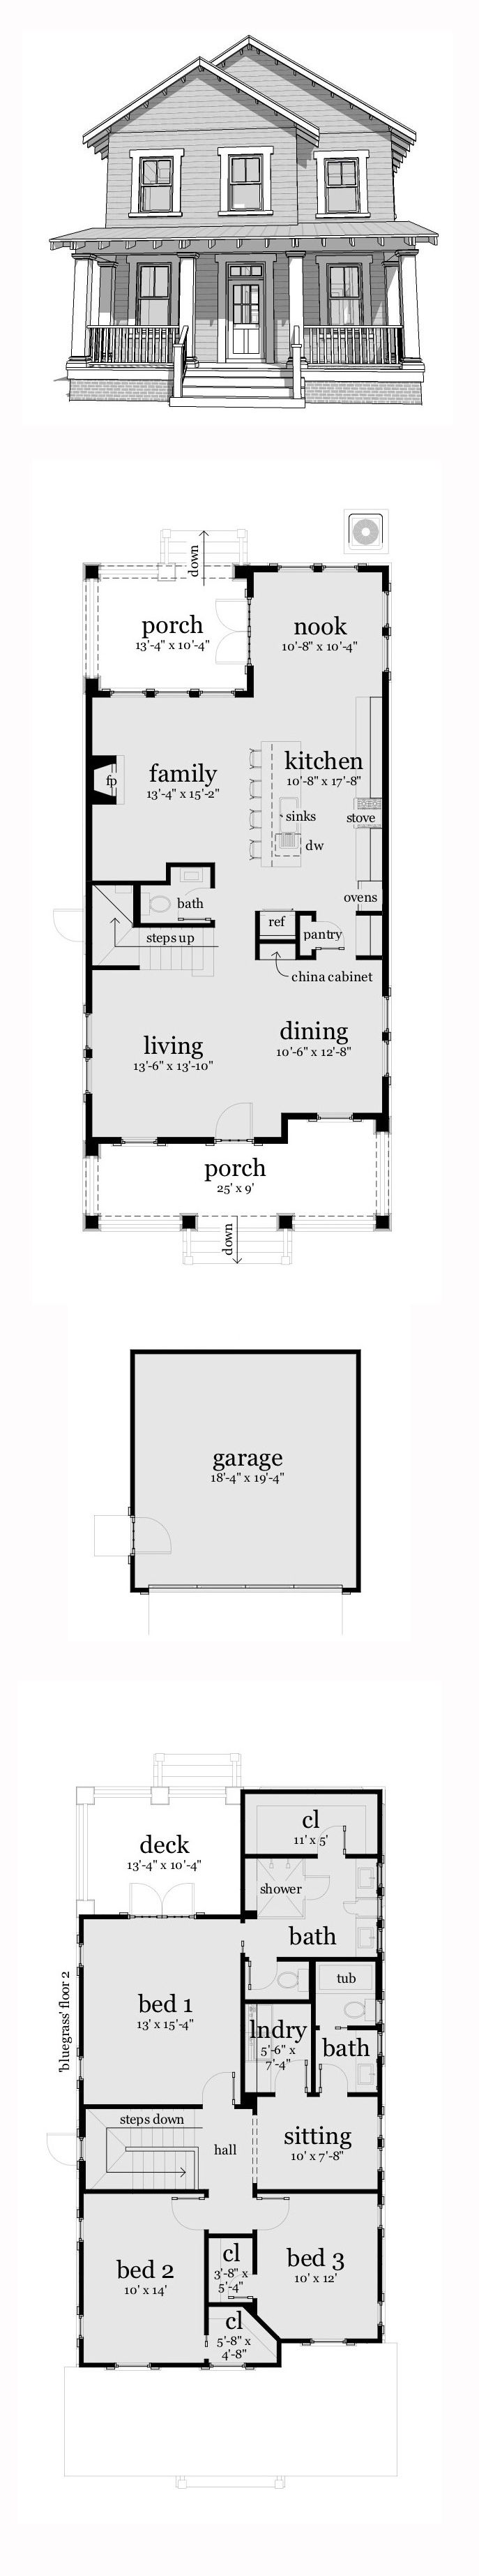 farmhouse house plan 70816 - Narrow House Plans